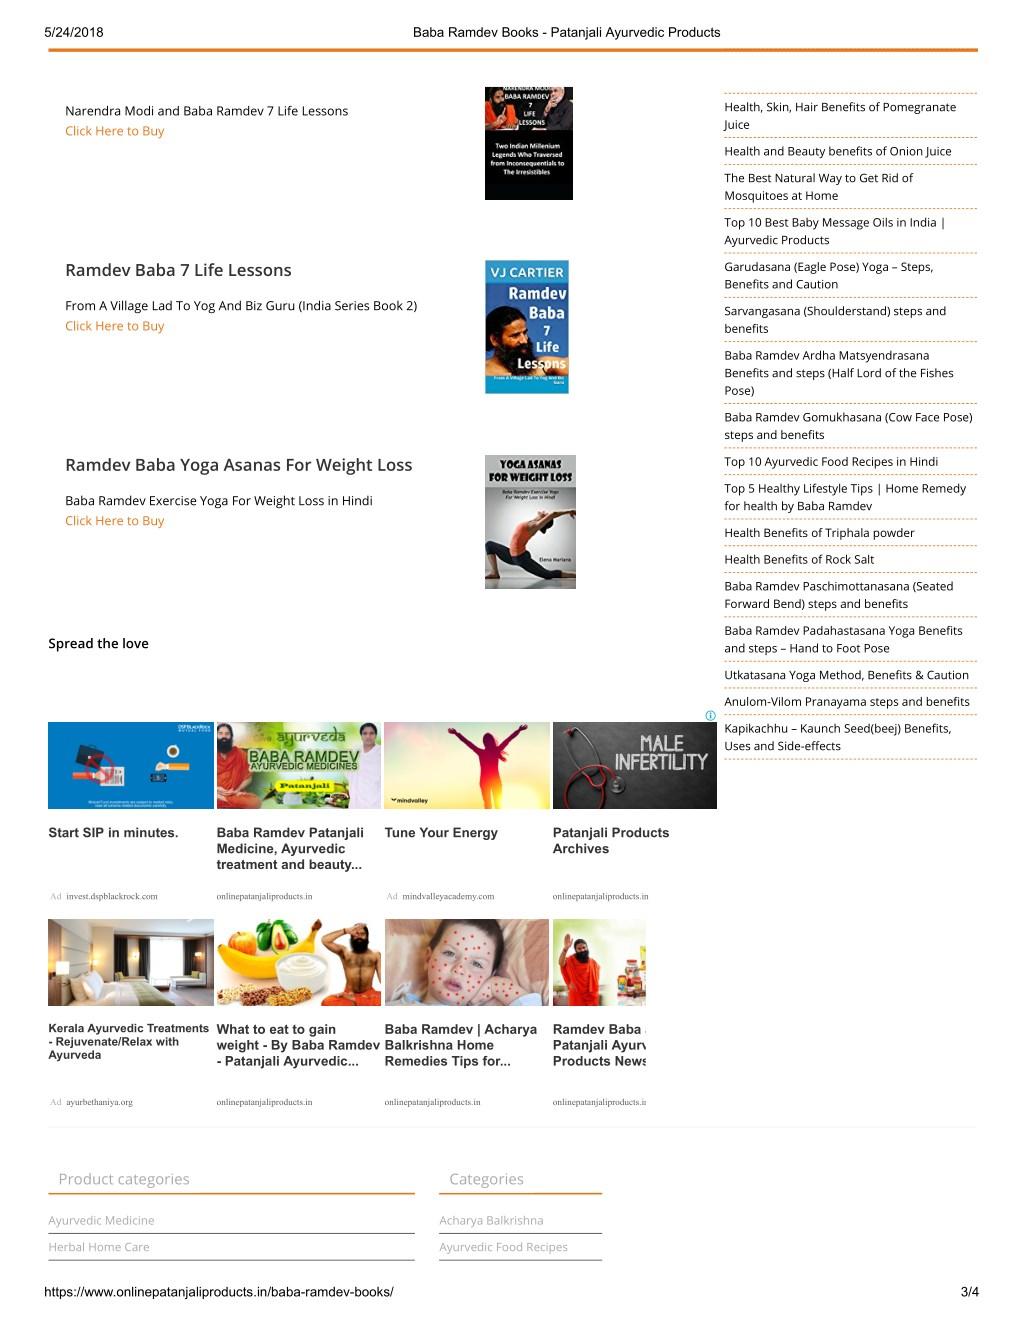 PPT - Baba Ramdev Yoga Books PowerPoint Presentation - ID:7879700